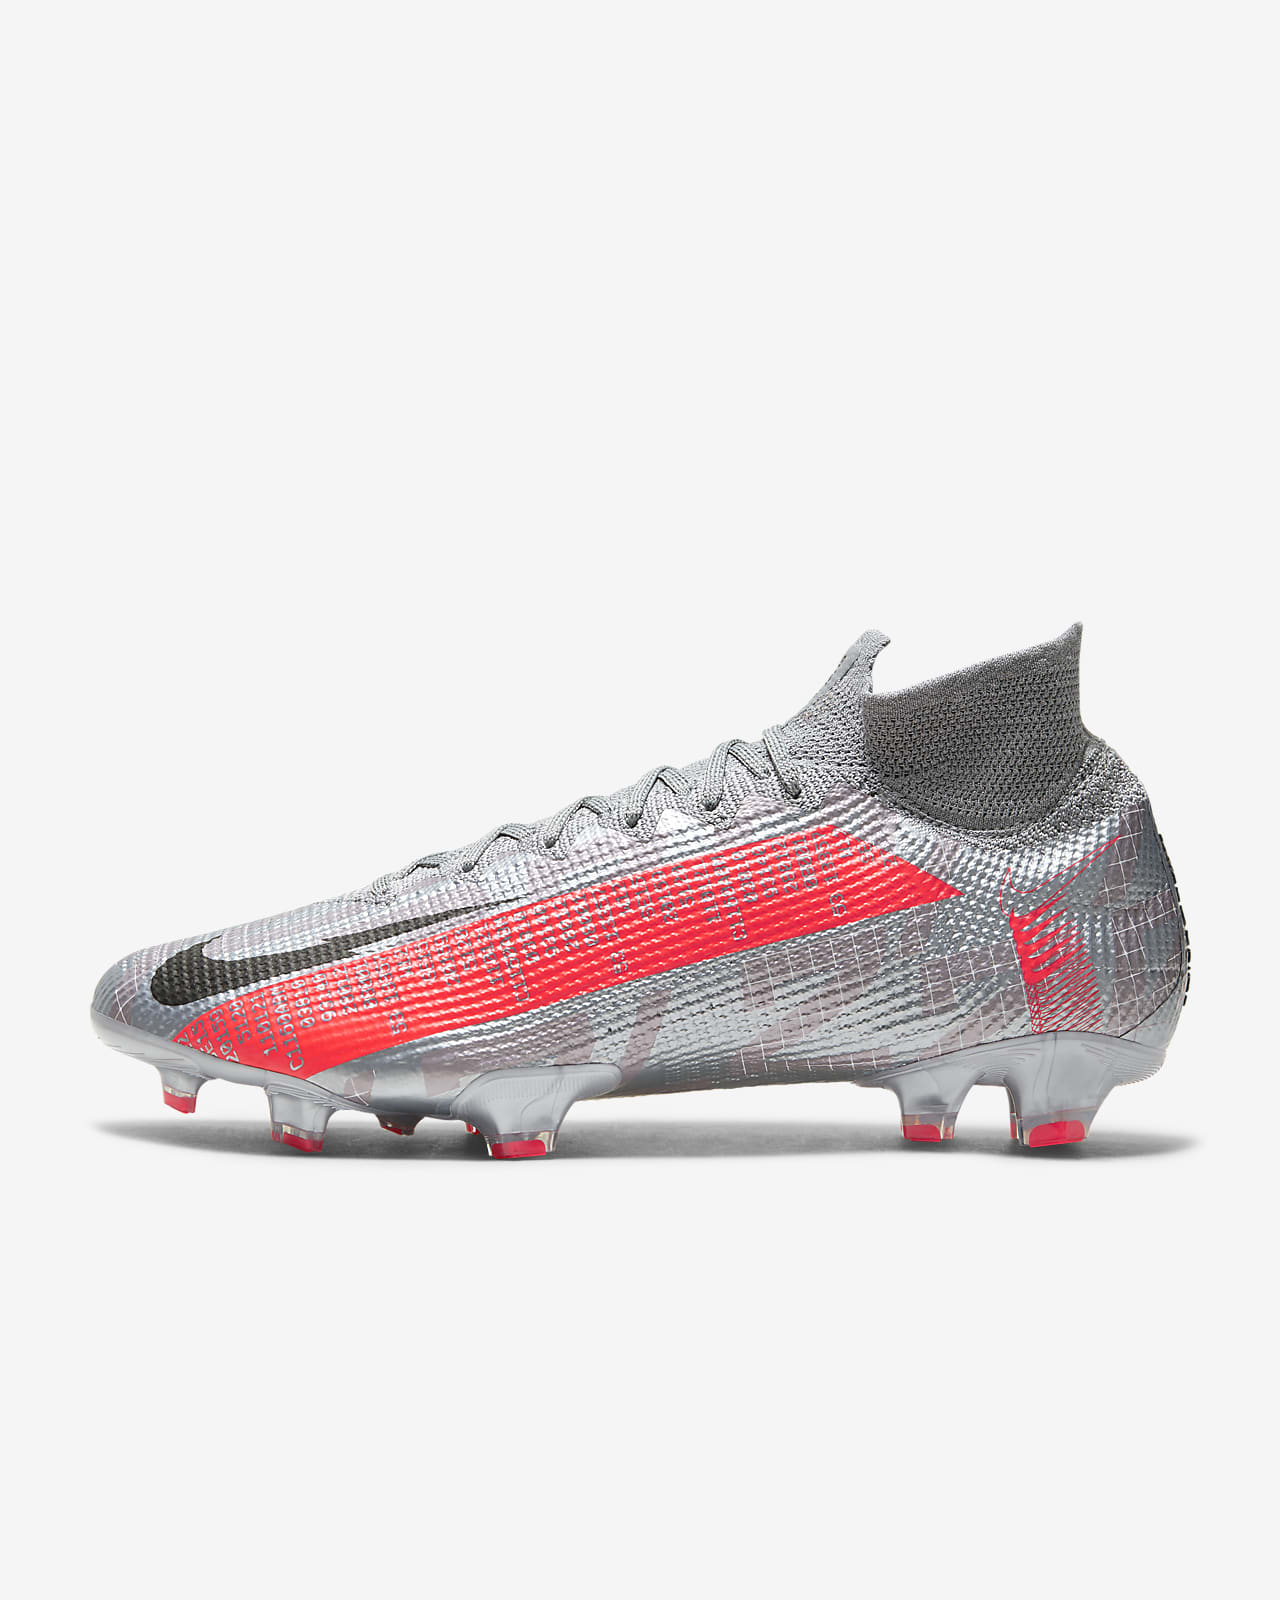 Nike Mercurial Superfly 7 Elite FG 天然偏硬草地英式足球釘鞋